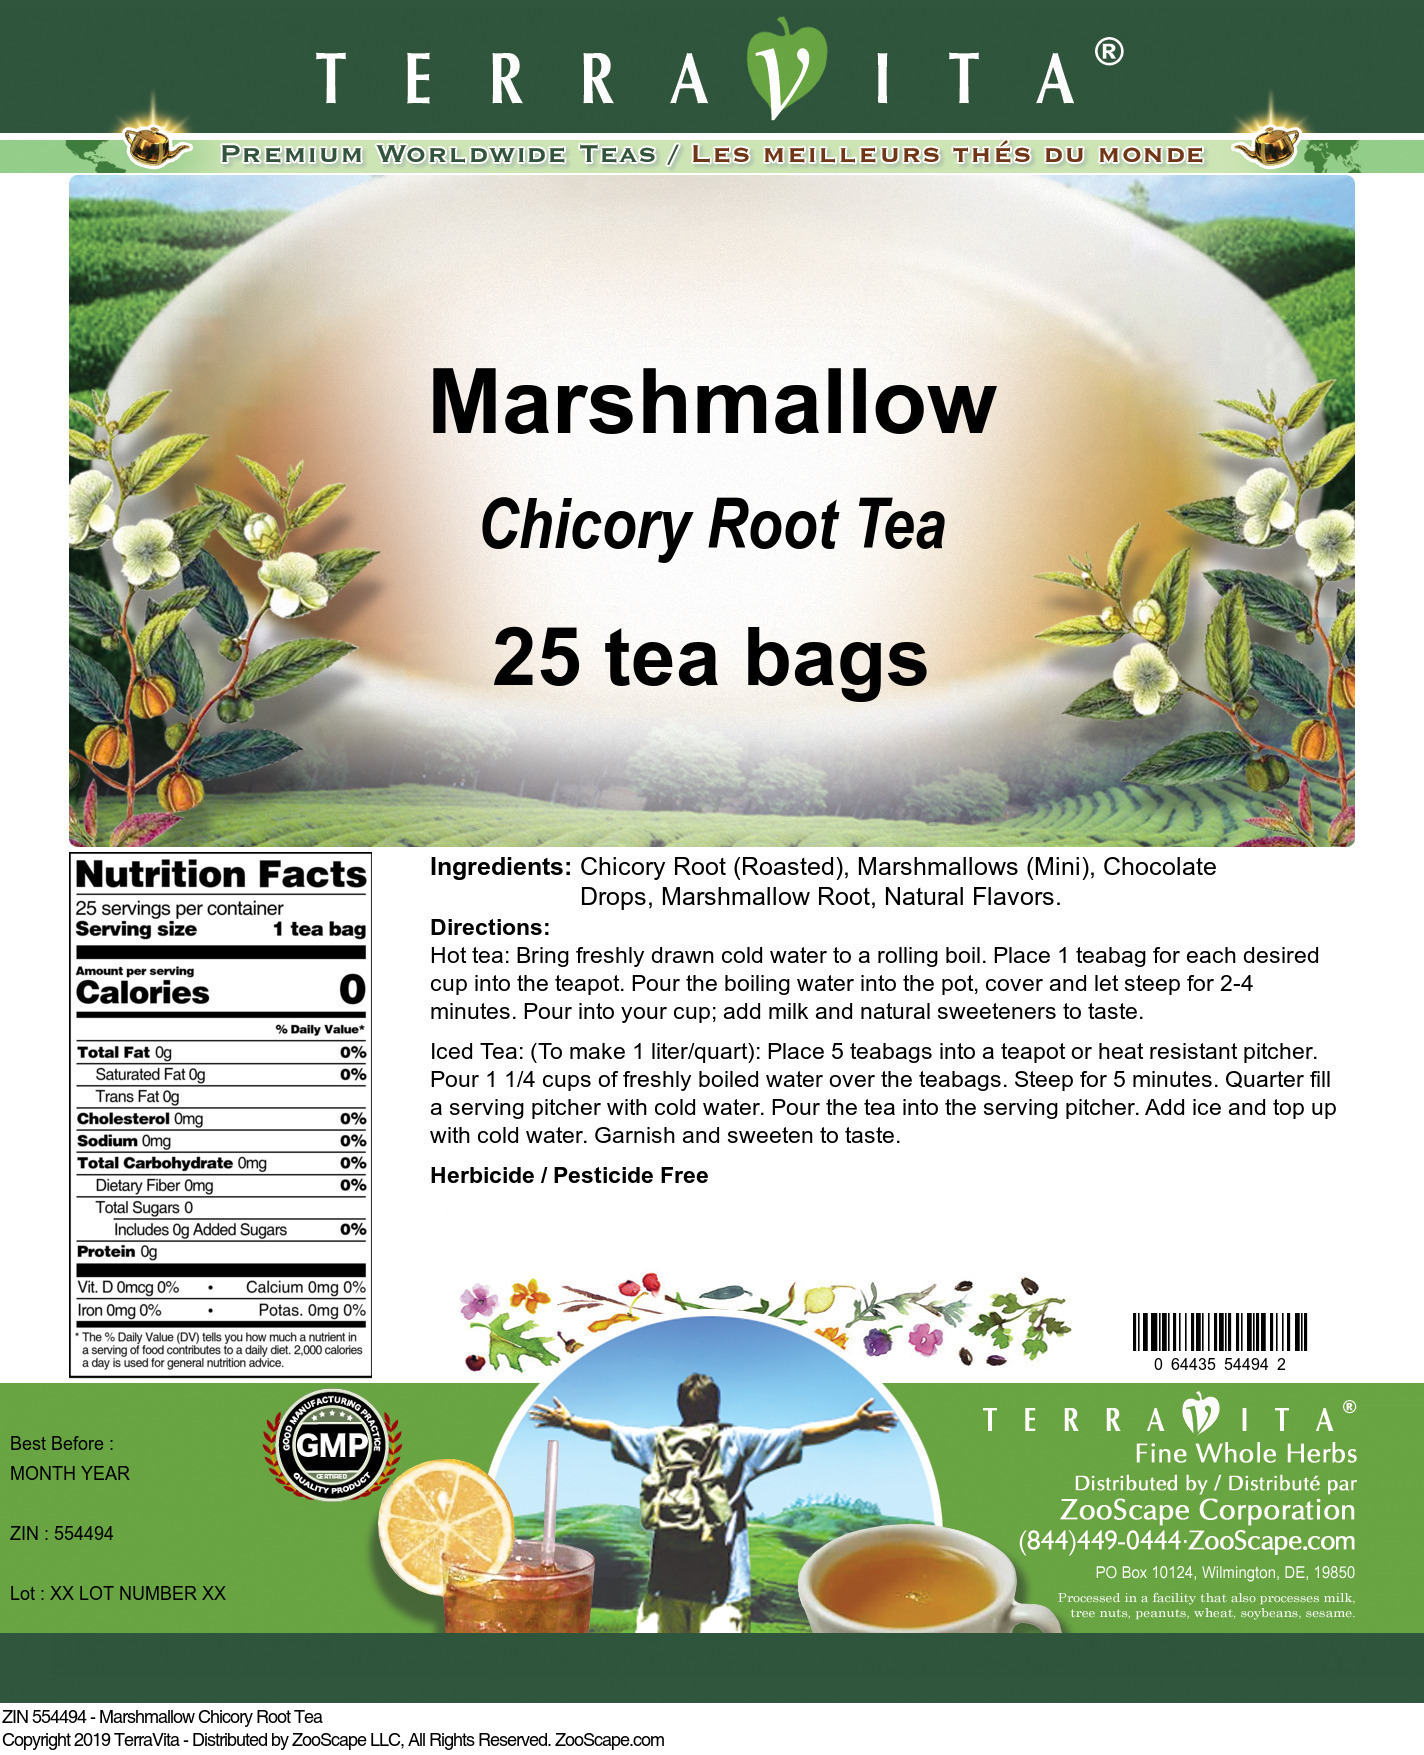 Marshmallow Chicory Root Tea